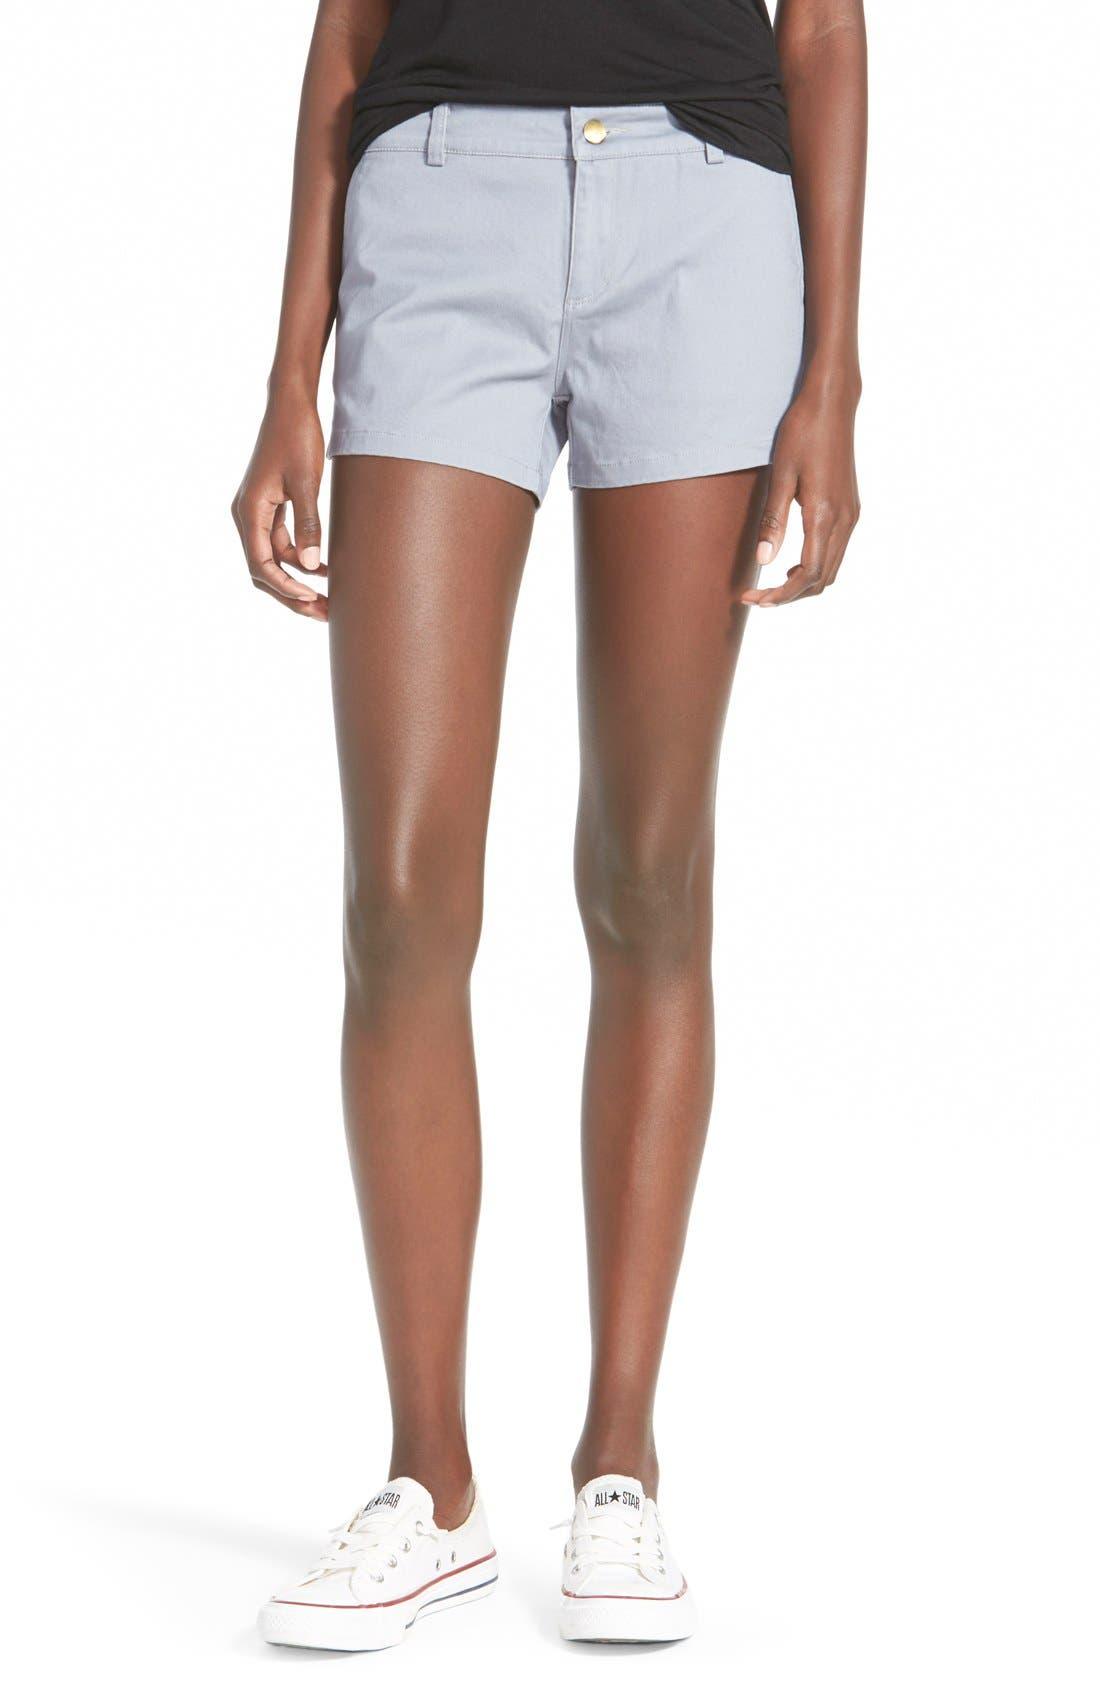 Main Image - The Hanger Woven Shorts